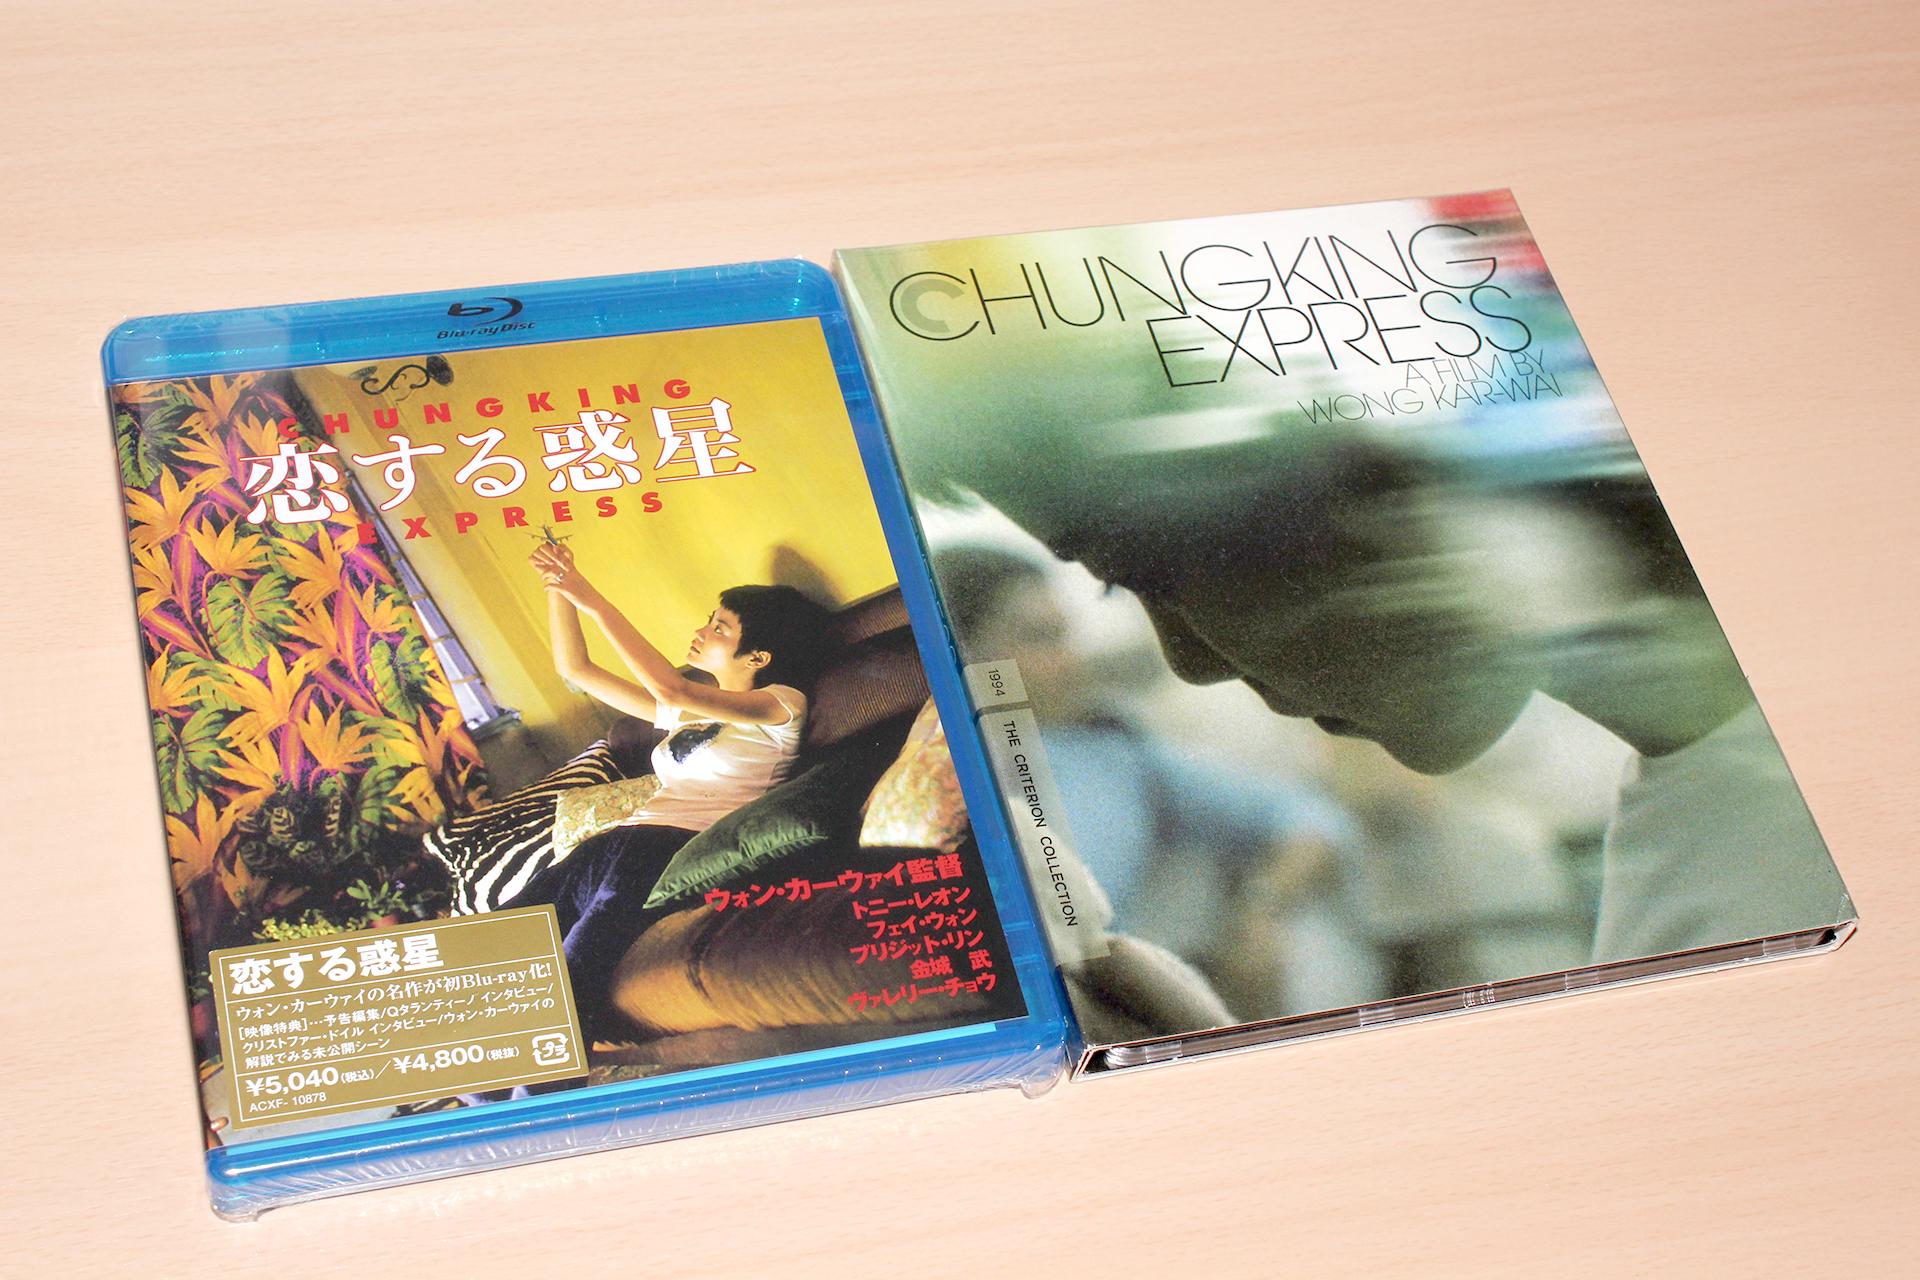 2013-08-07-Chungking_Express-1.JPG